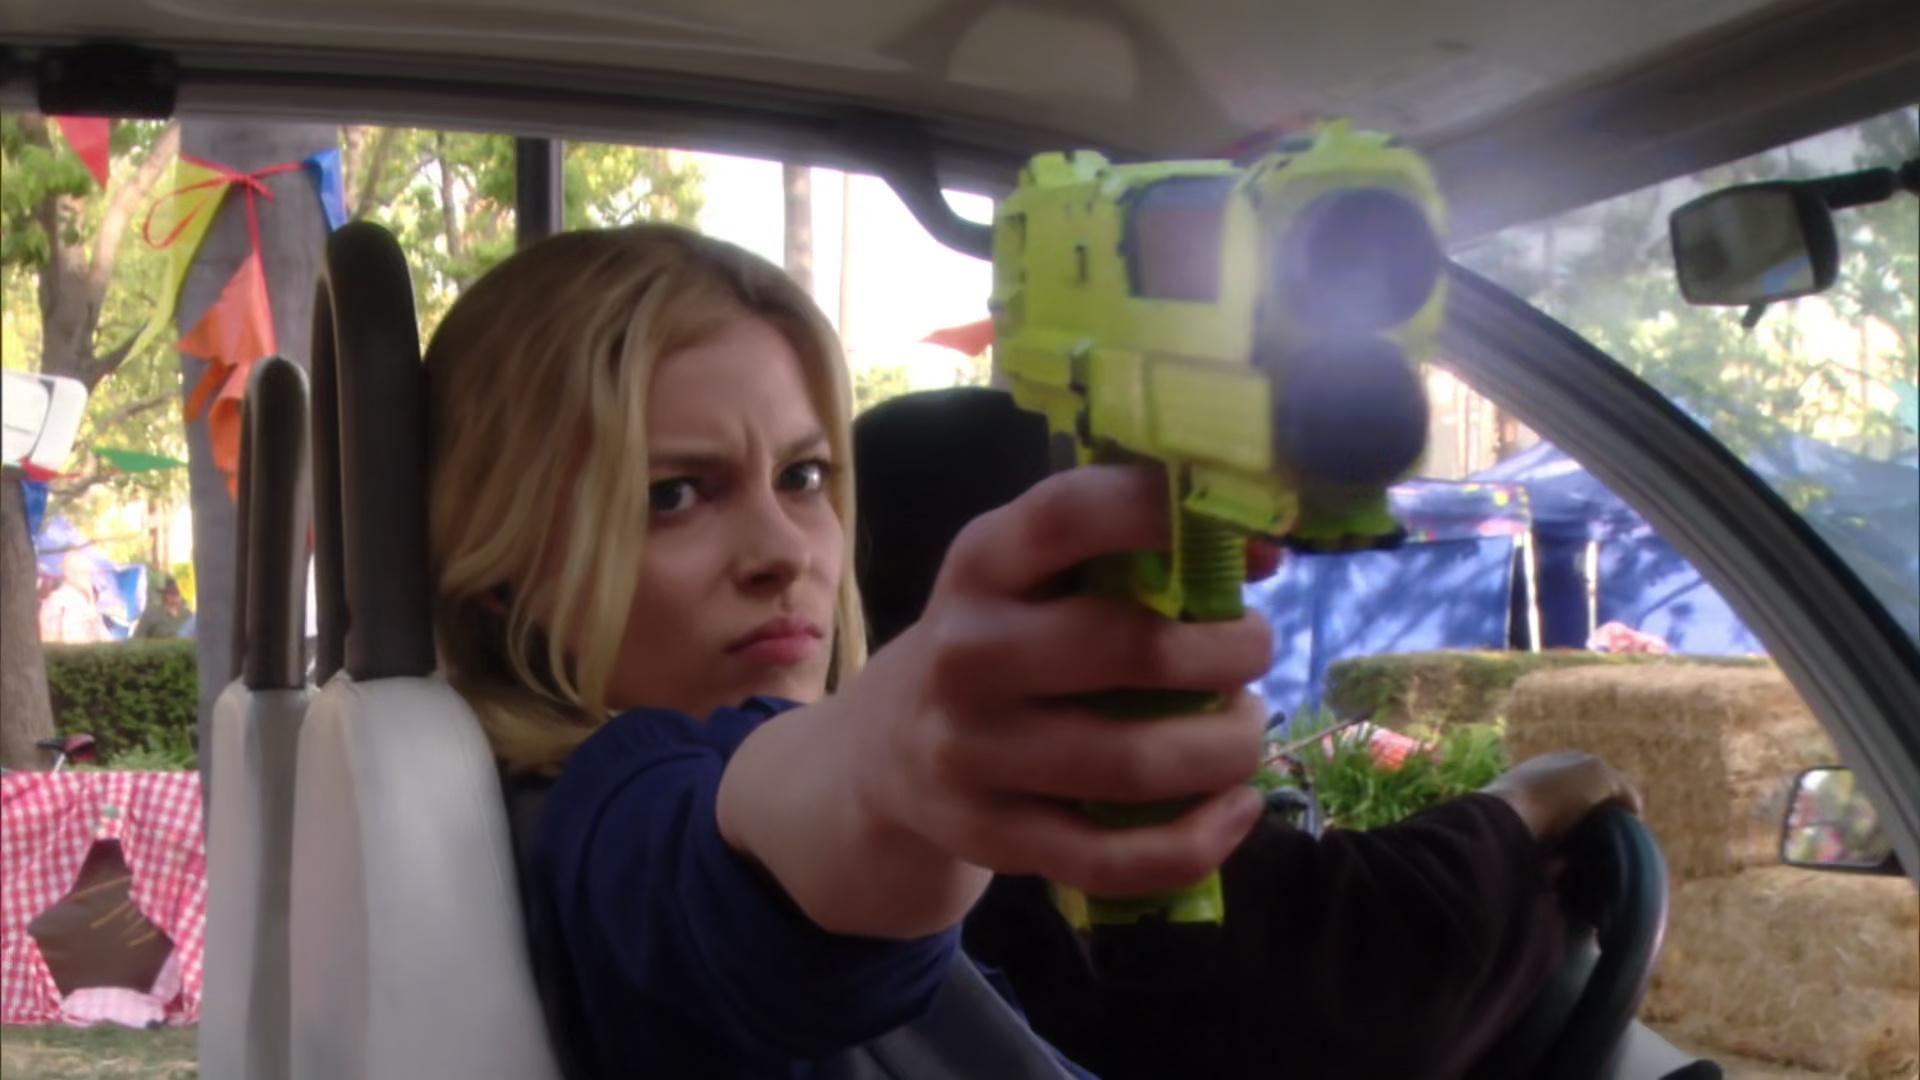 FAFPBM-Britta gun edited-1